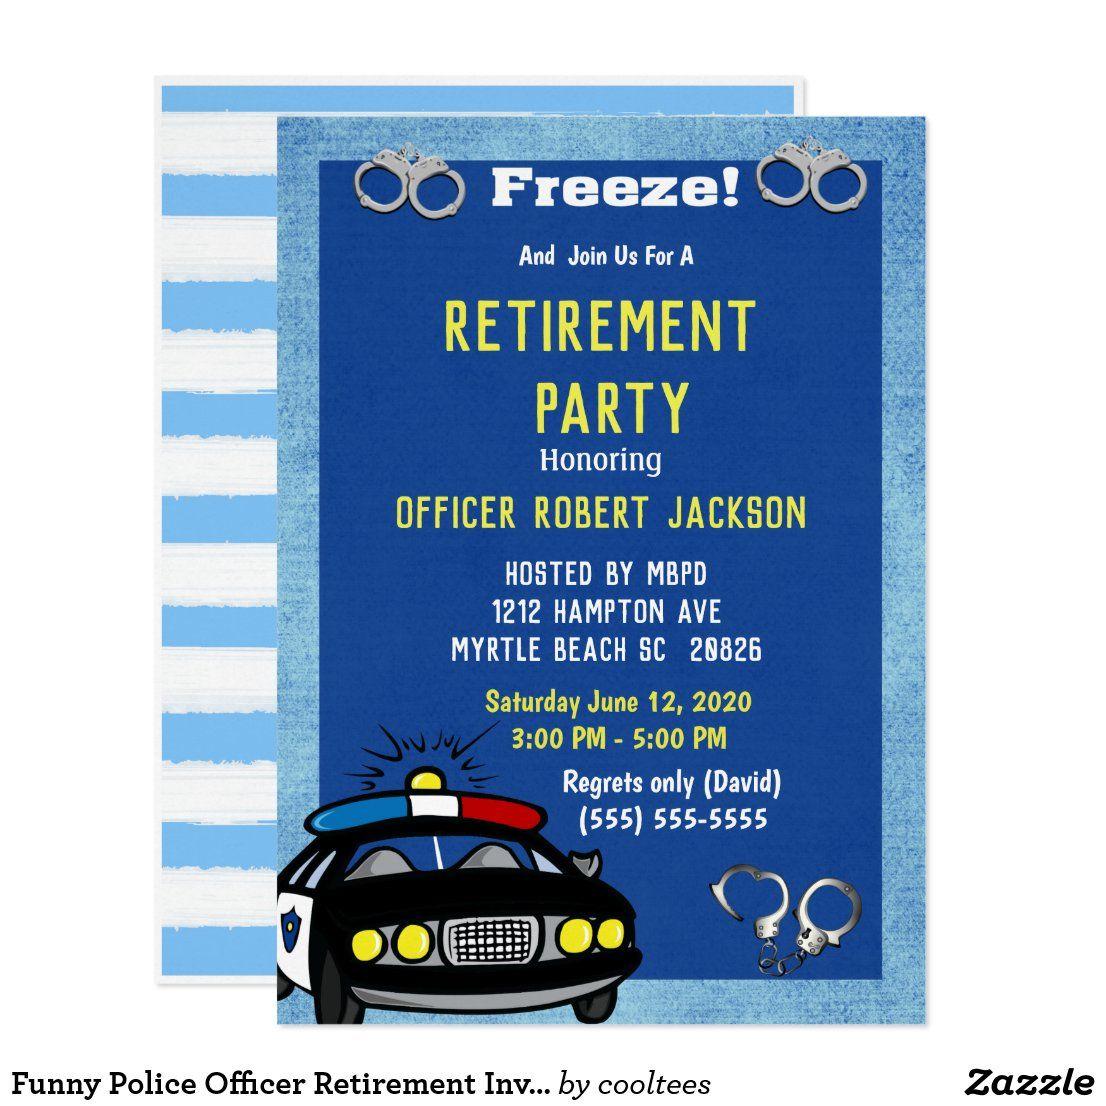 Funny Police Officer Retirement Invitation | Zazzle.com